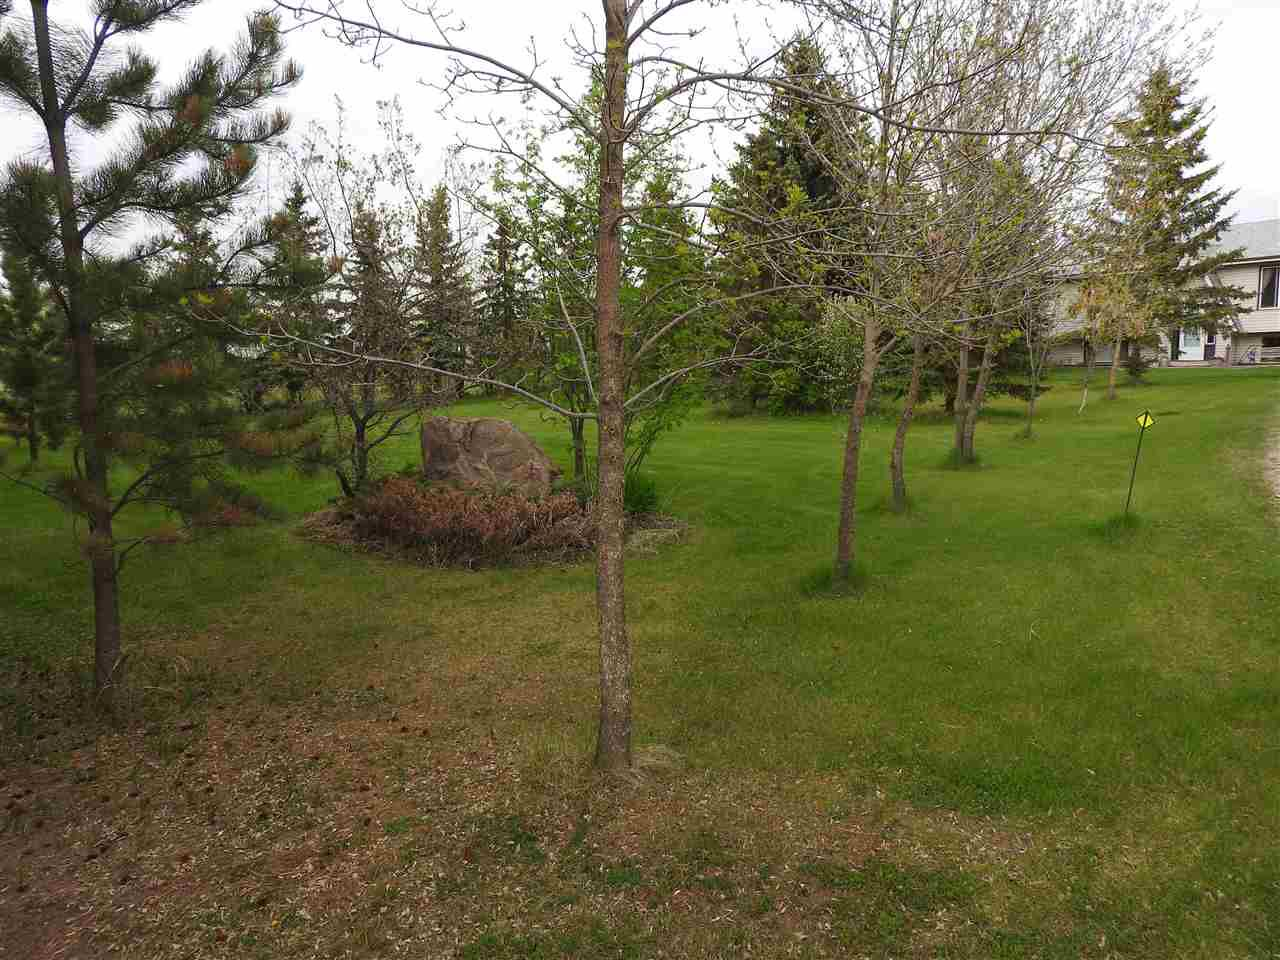 Photo 28: Photos: 55301 RGE RD 262: Rural Sturgeon County House for sale : MLS®# E4158158